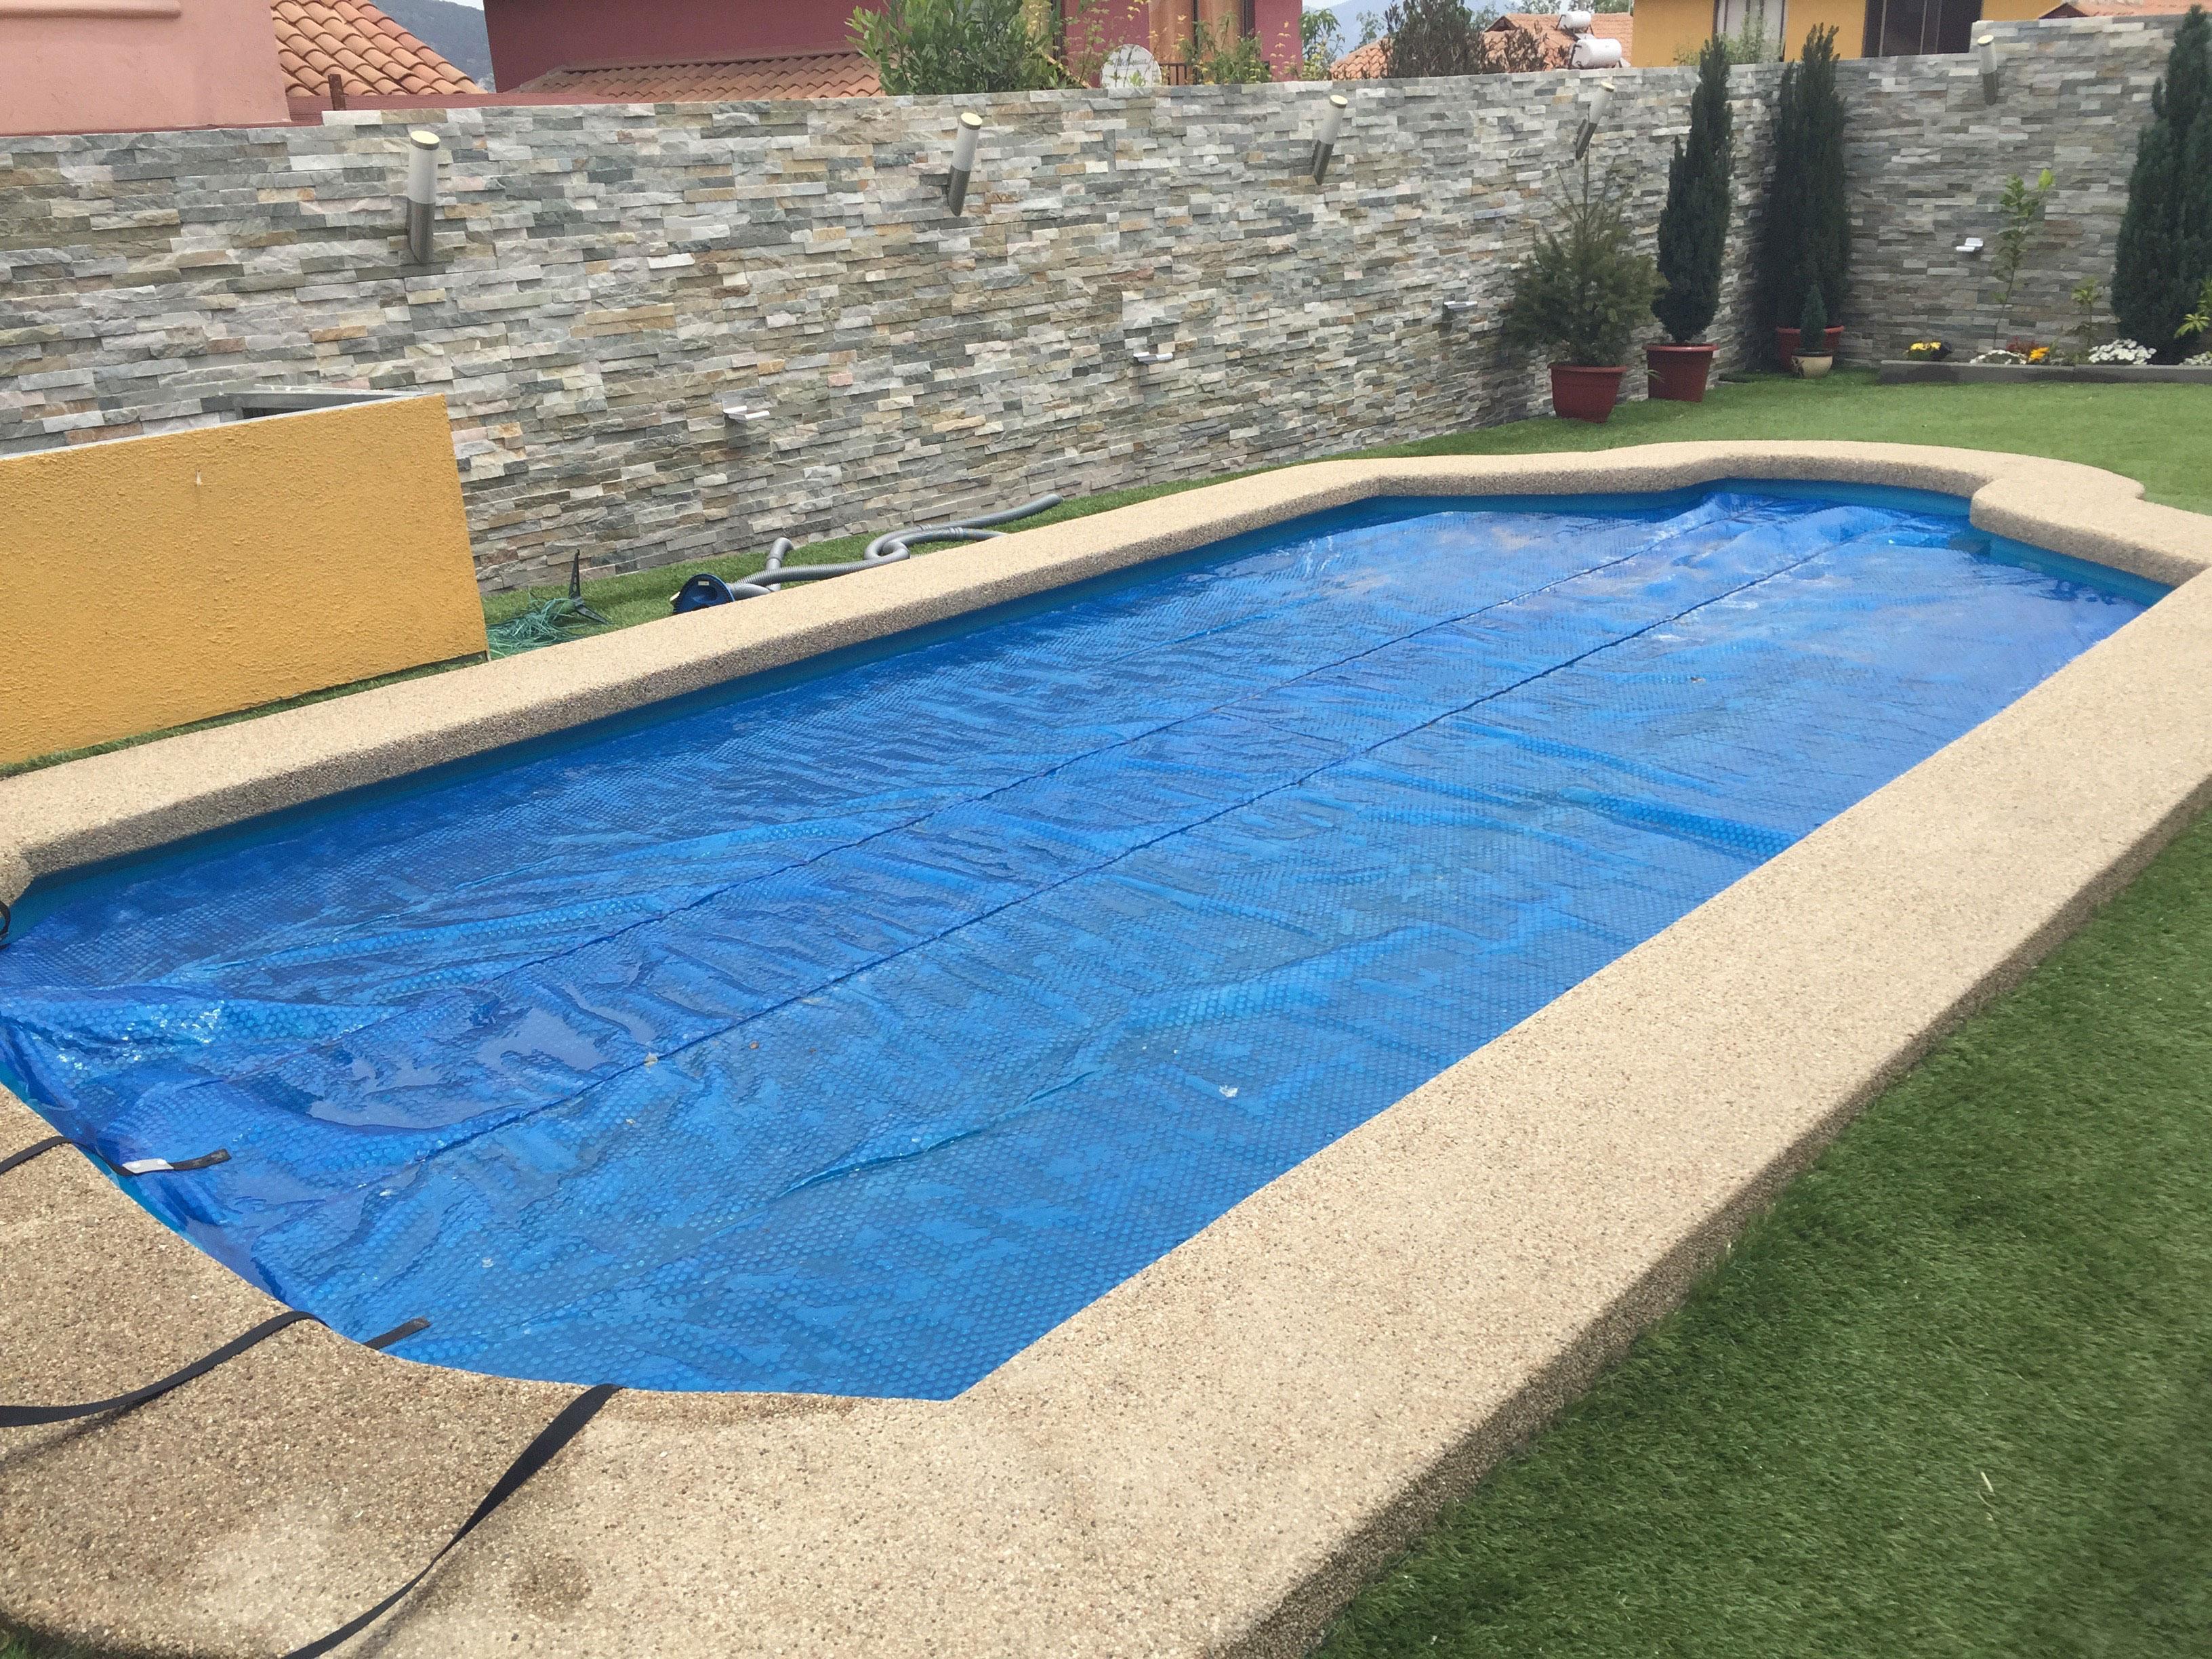 Precios de piscinas de fibra awesome piscina enterrada de for Piscina fibra precio